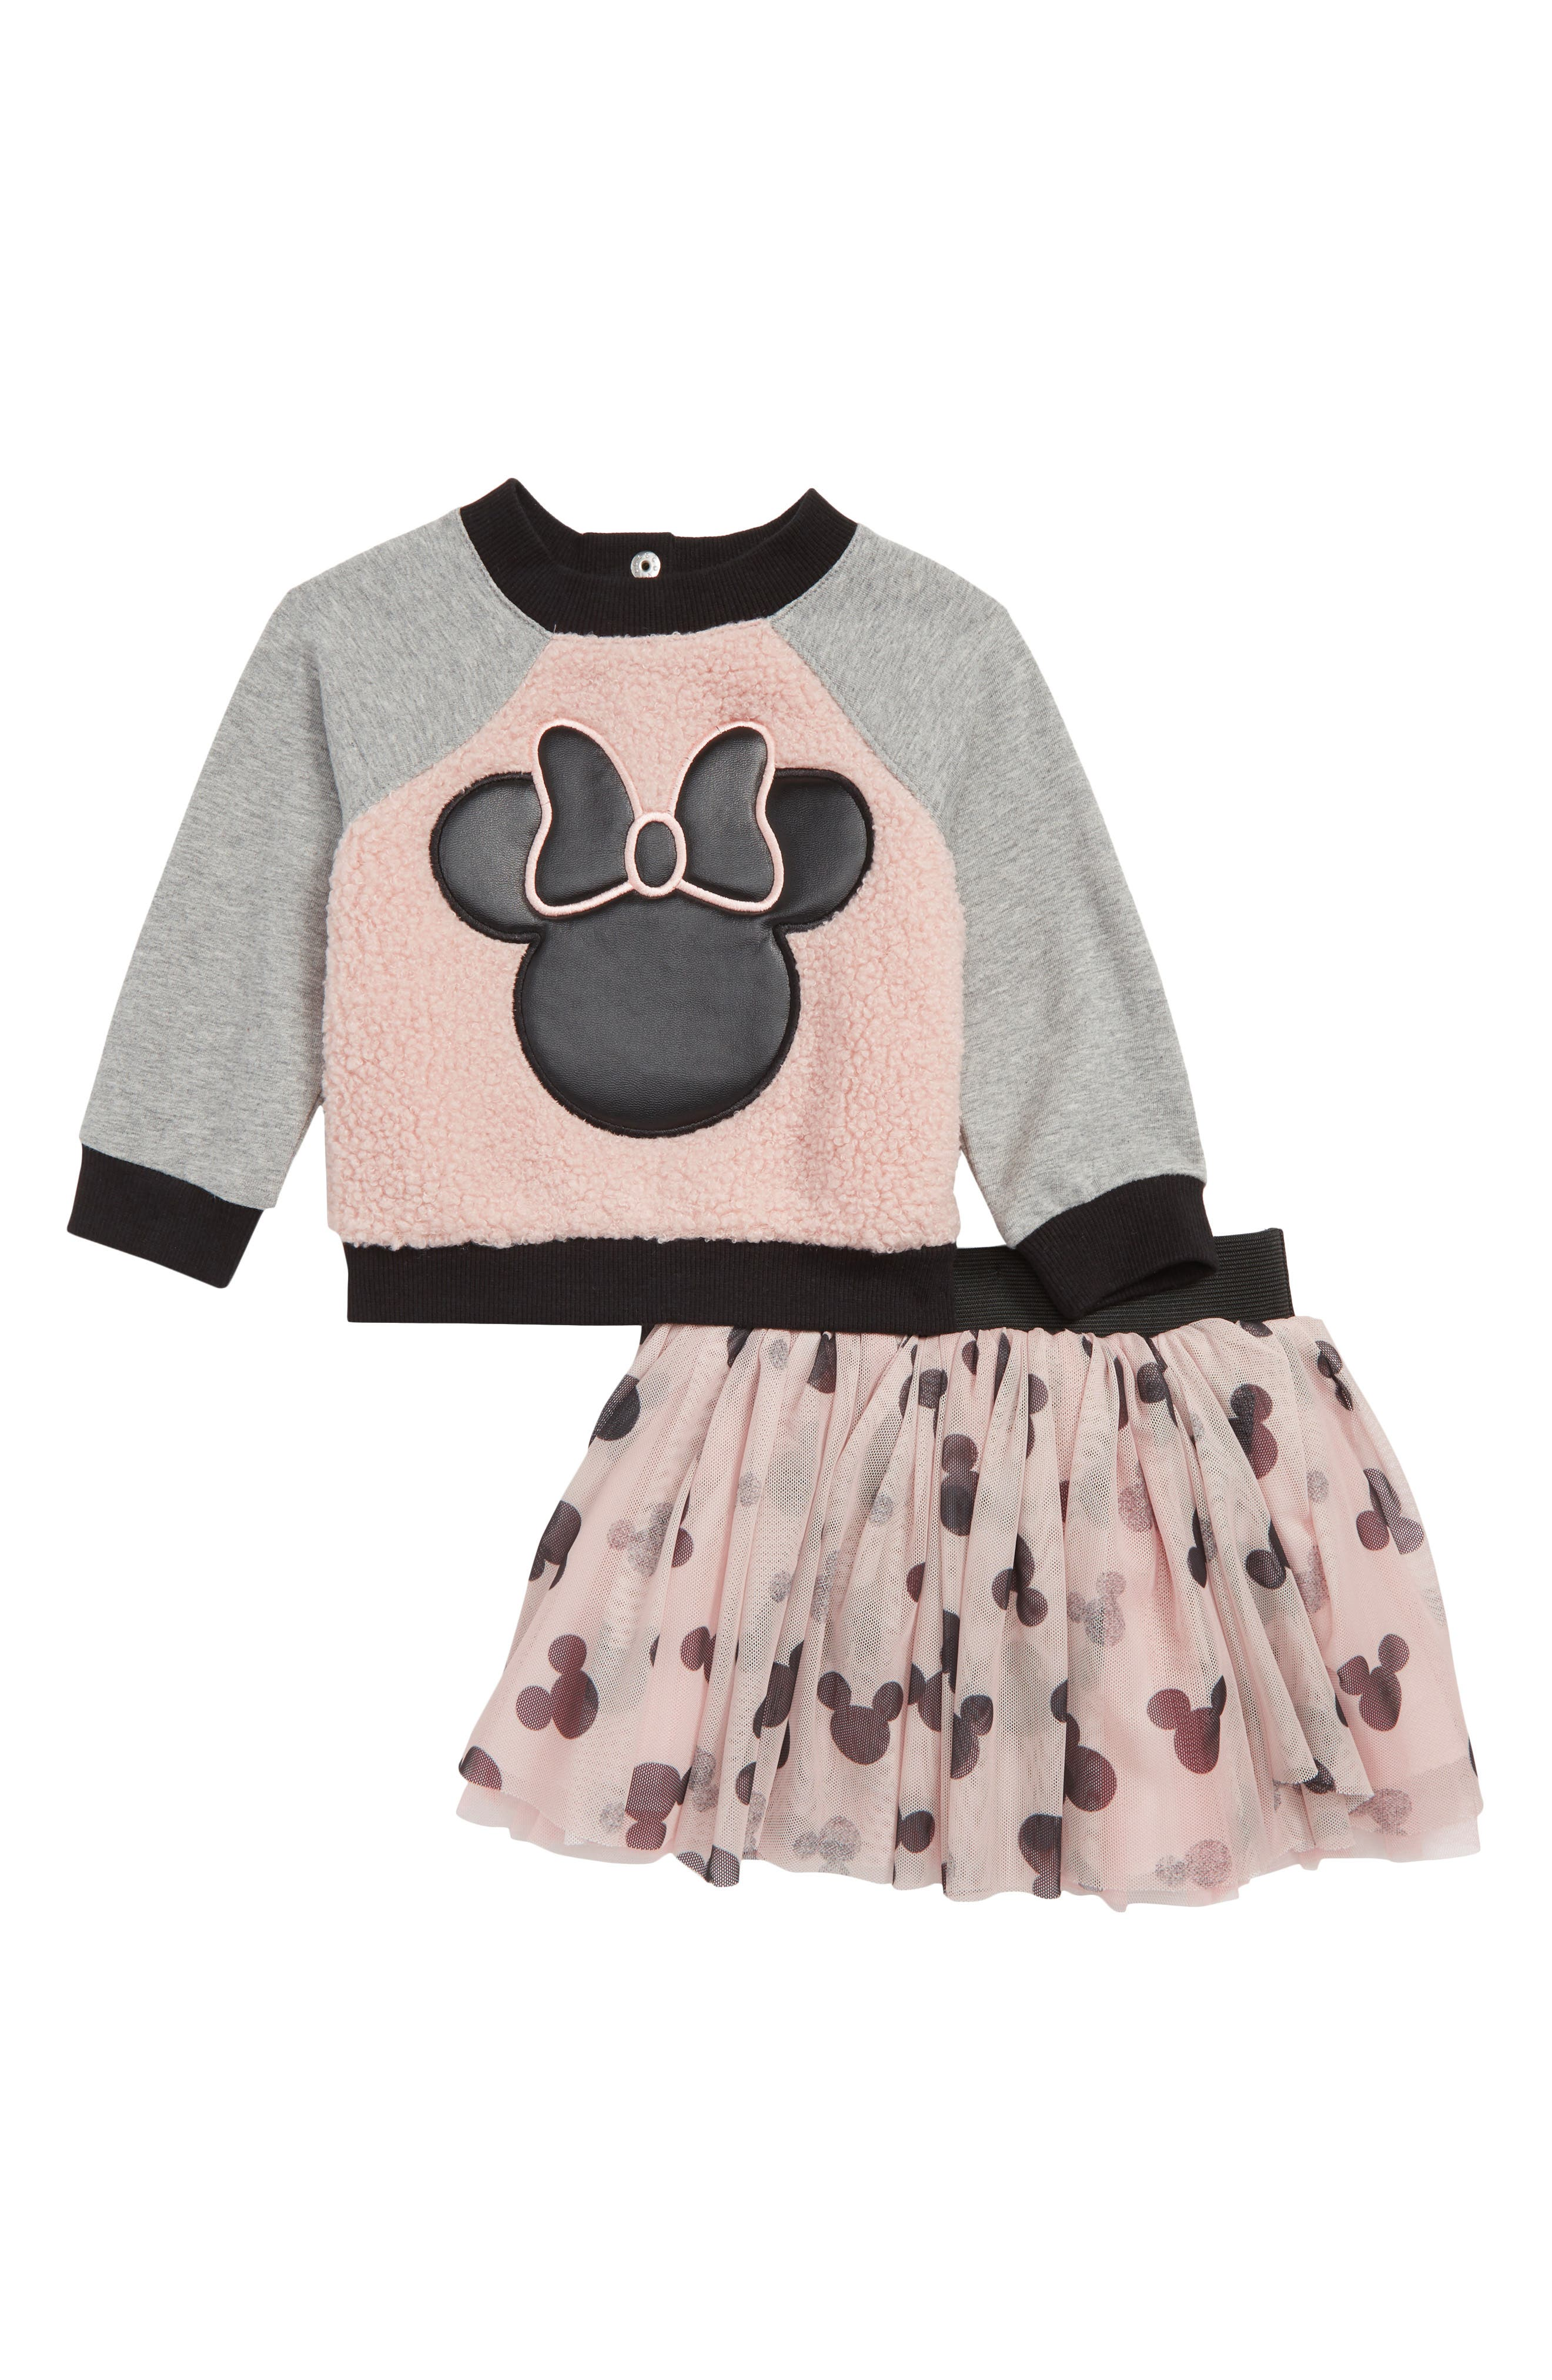 x Disney Minnie Mouse Pullover & Tutu Skirt Set,                             Main thumbnail 1, color,                             PINK/ GREY